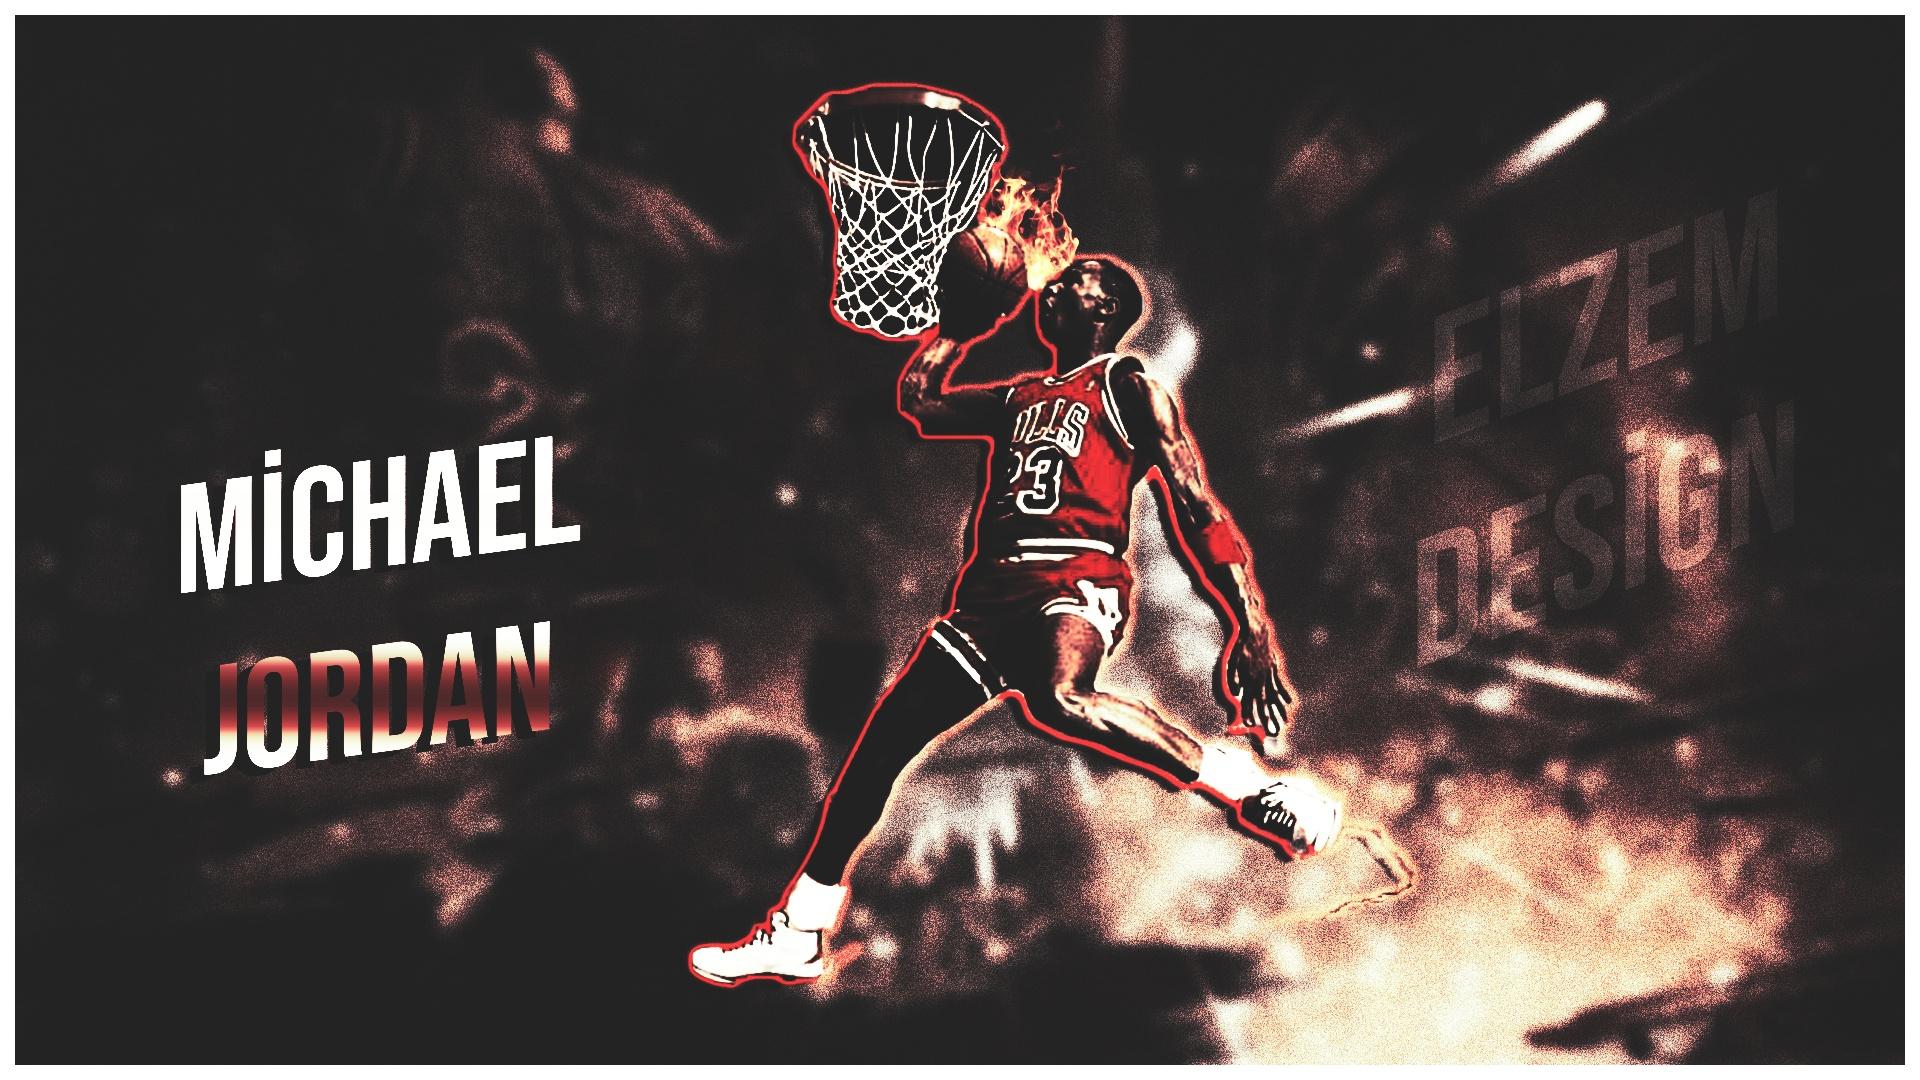 Michael Jordan pc wallpaper